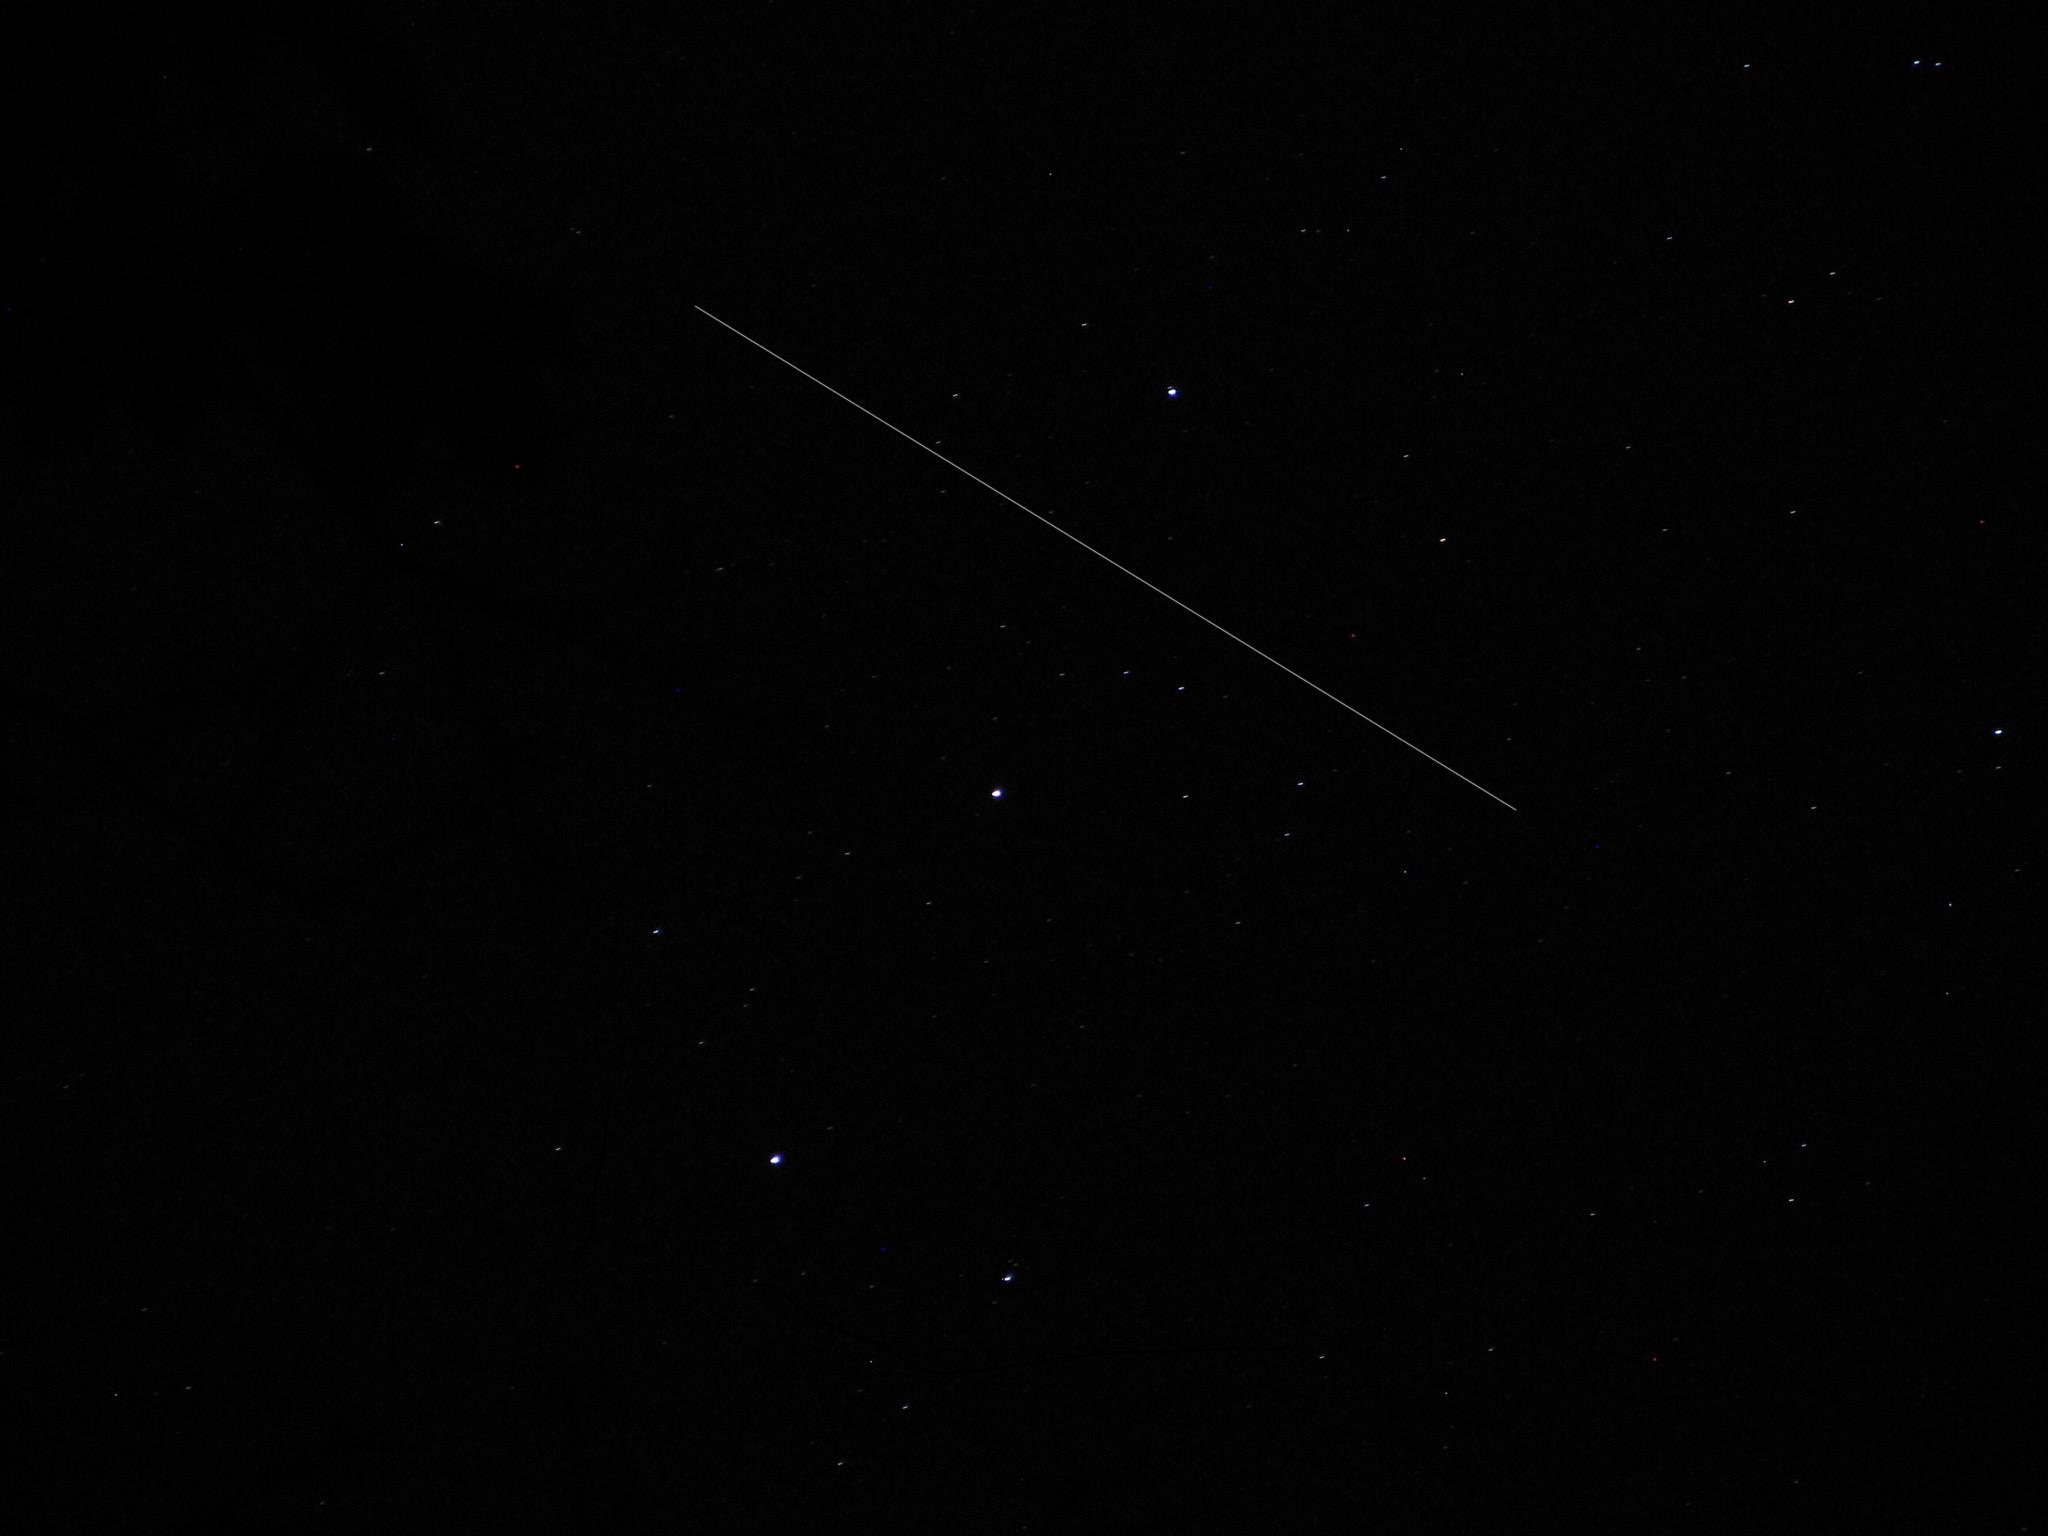 ISS Streaking Through Orion's Belt